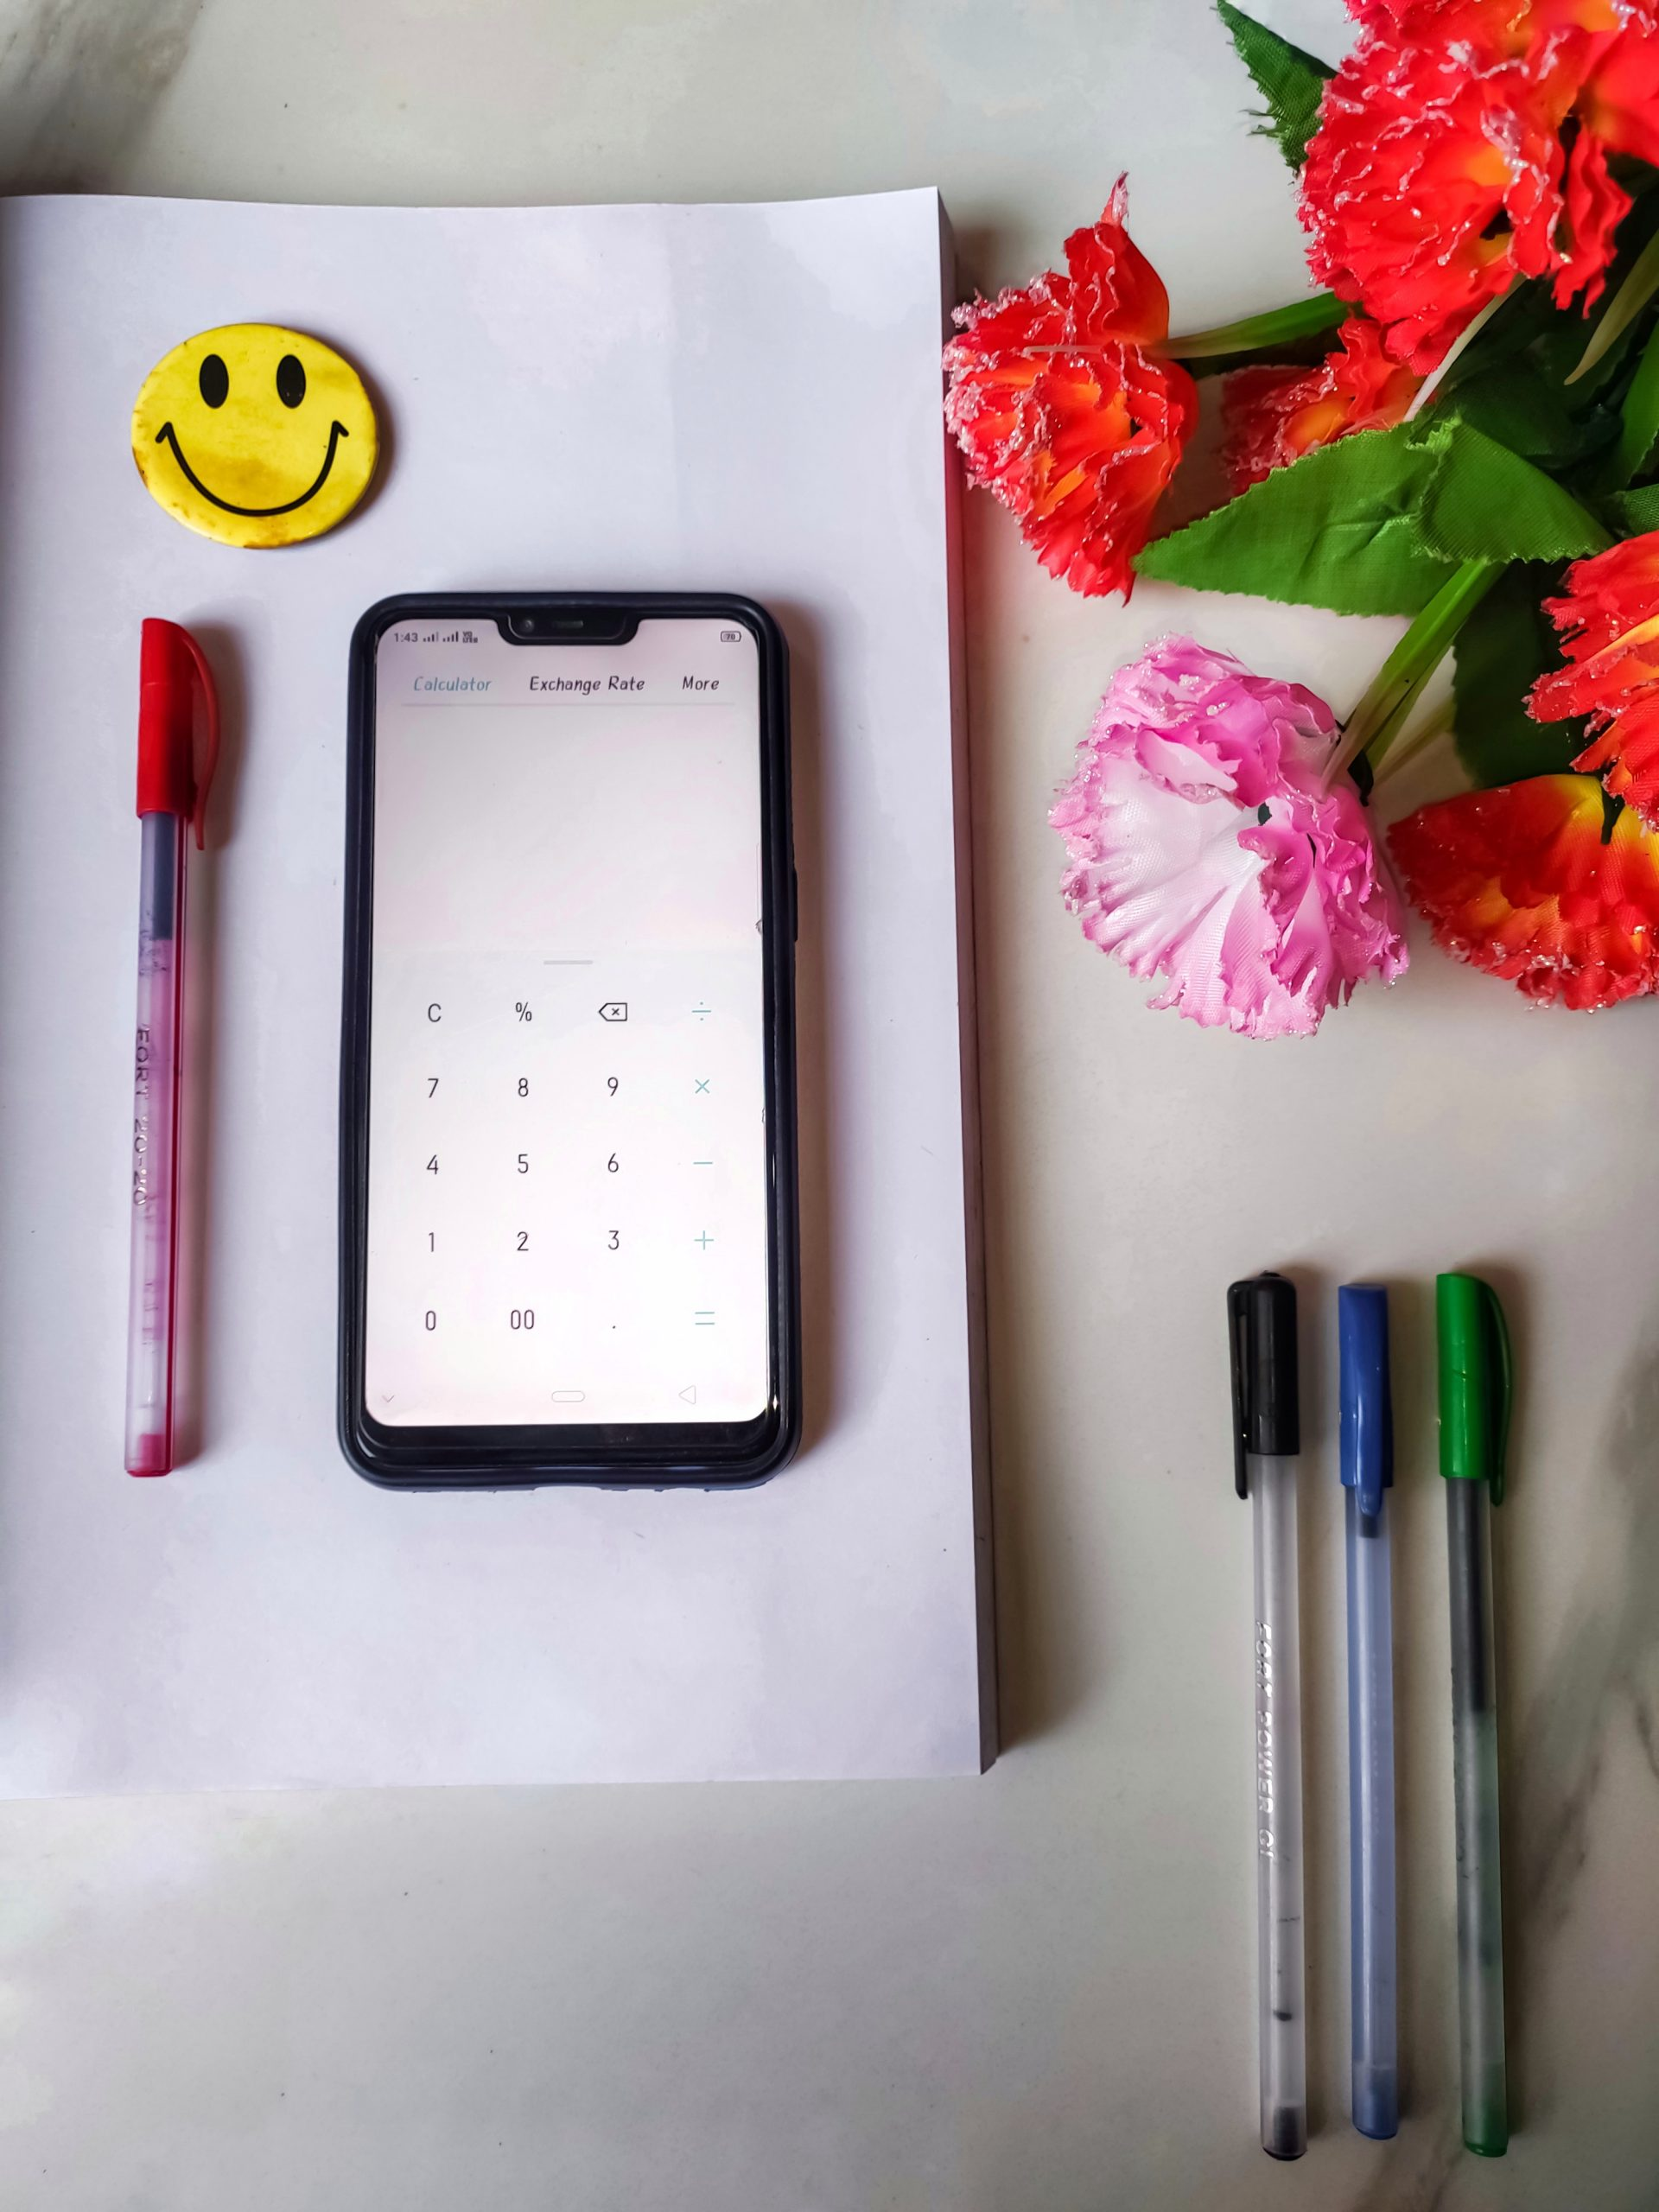 A mobile calculator on copy